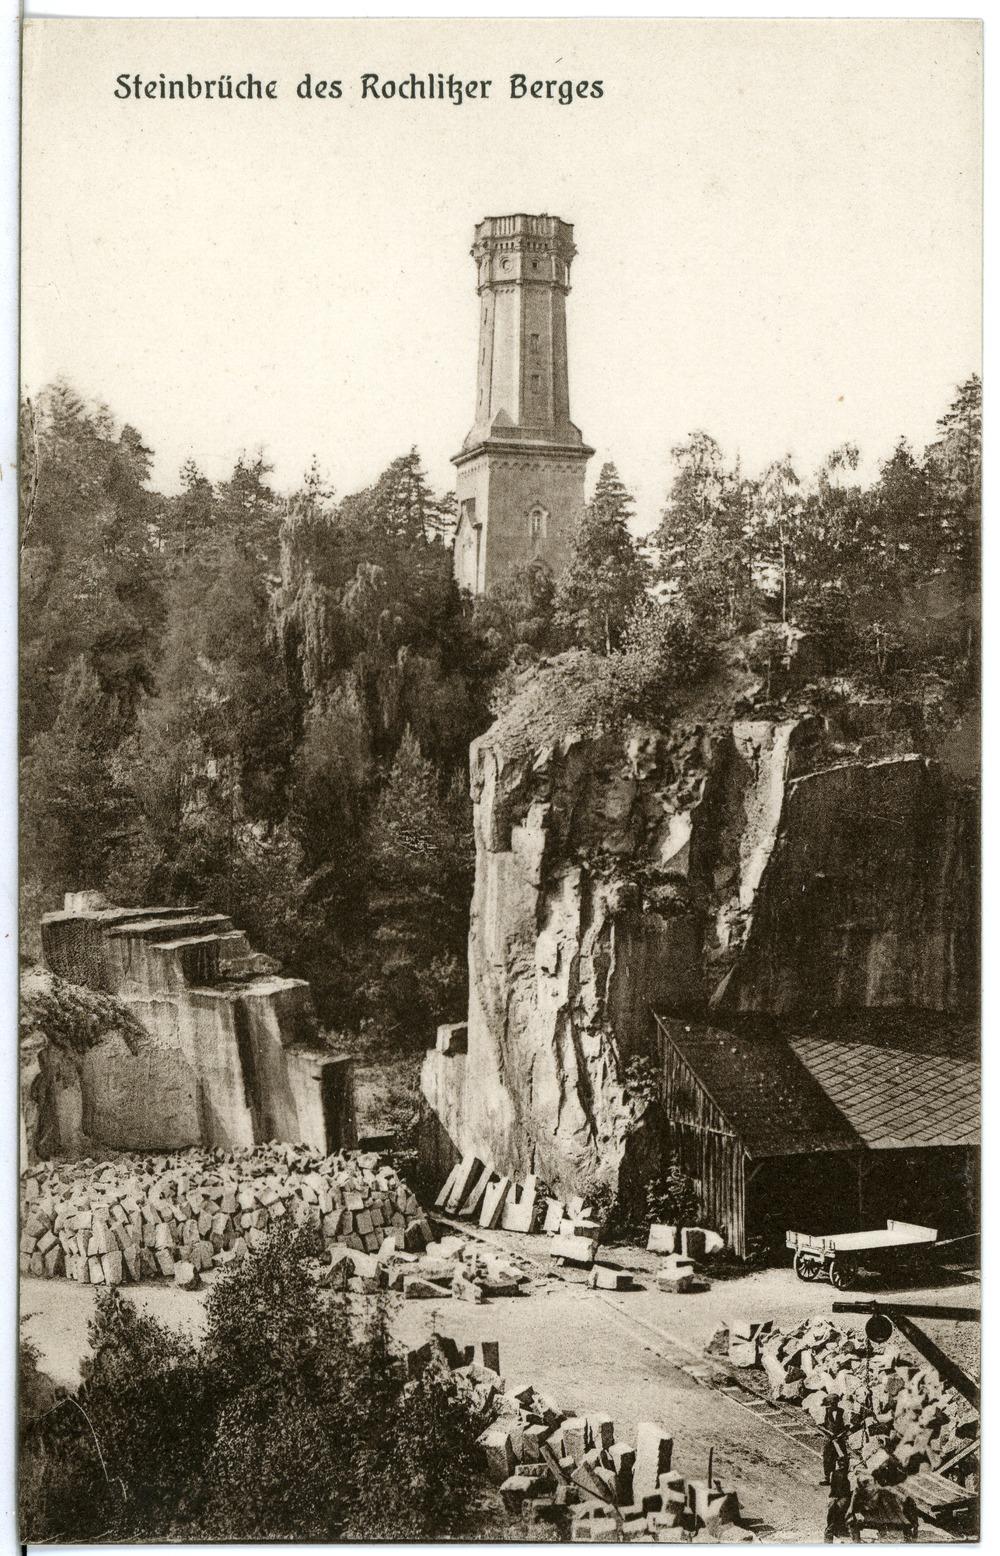 File:24639 Rochlitz 1929 Steinbrüche Des Rochlitzer Berges Brück U0026 Sohn